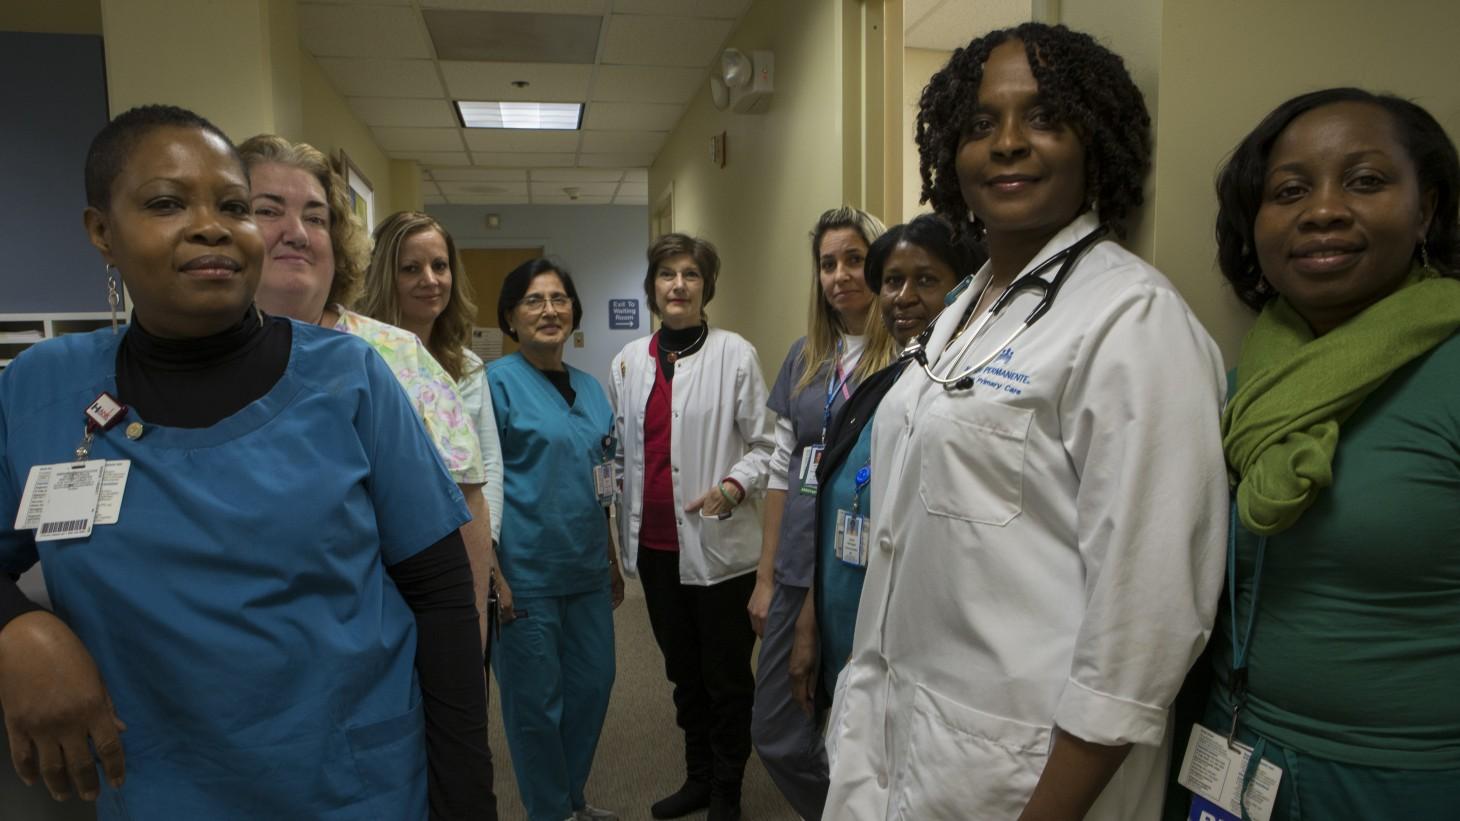 Adult Medicine team at Shady Grove Medical Center